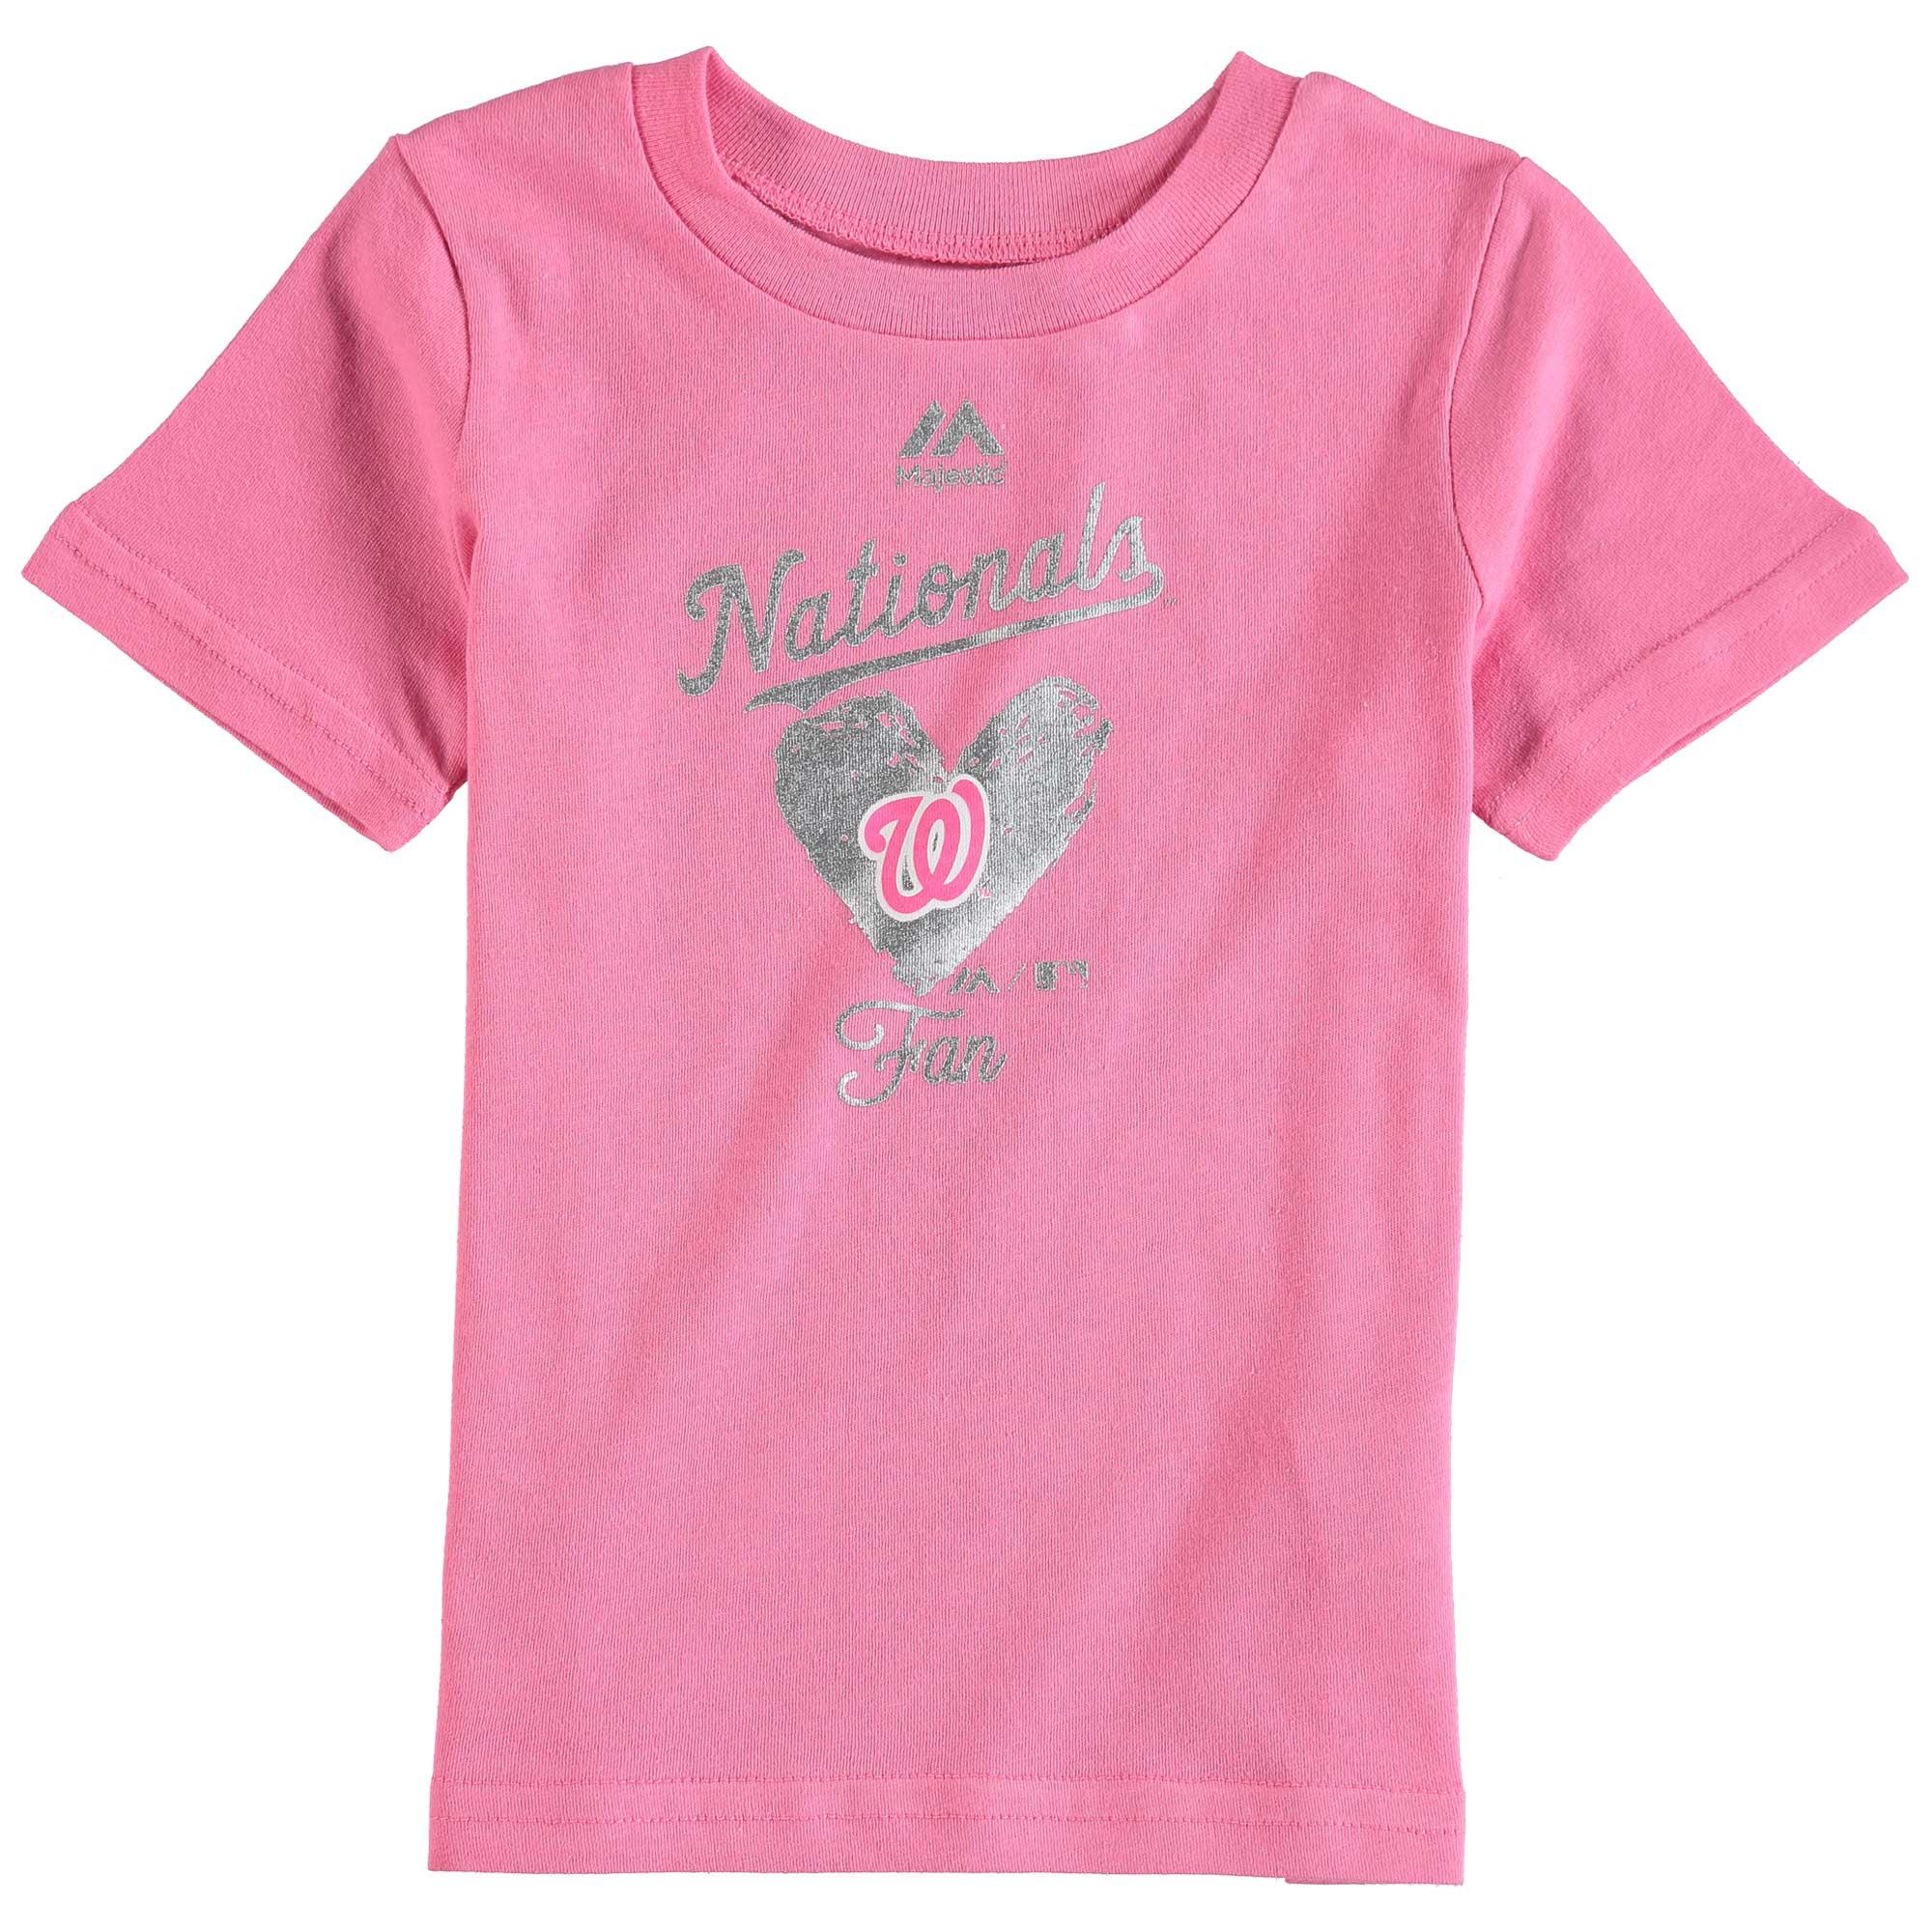 Washington Nationals Majestic Girls Infant Autograph T-Shirt - Pink